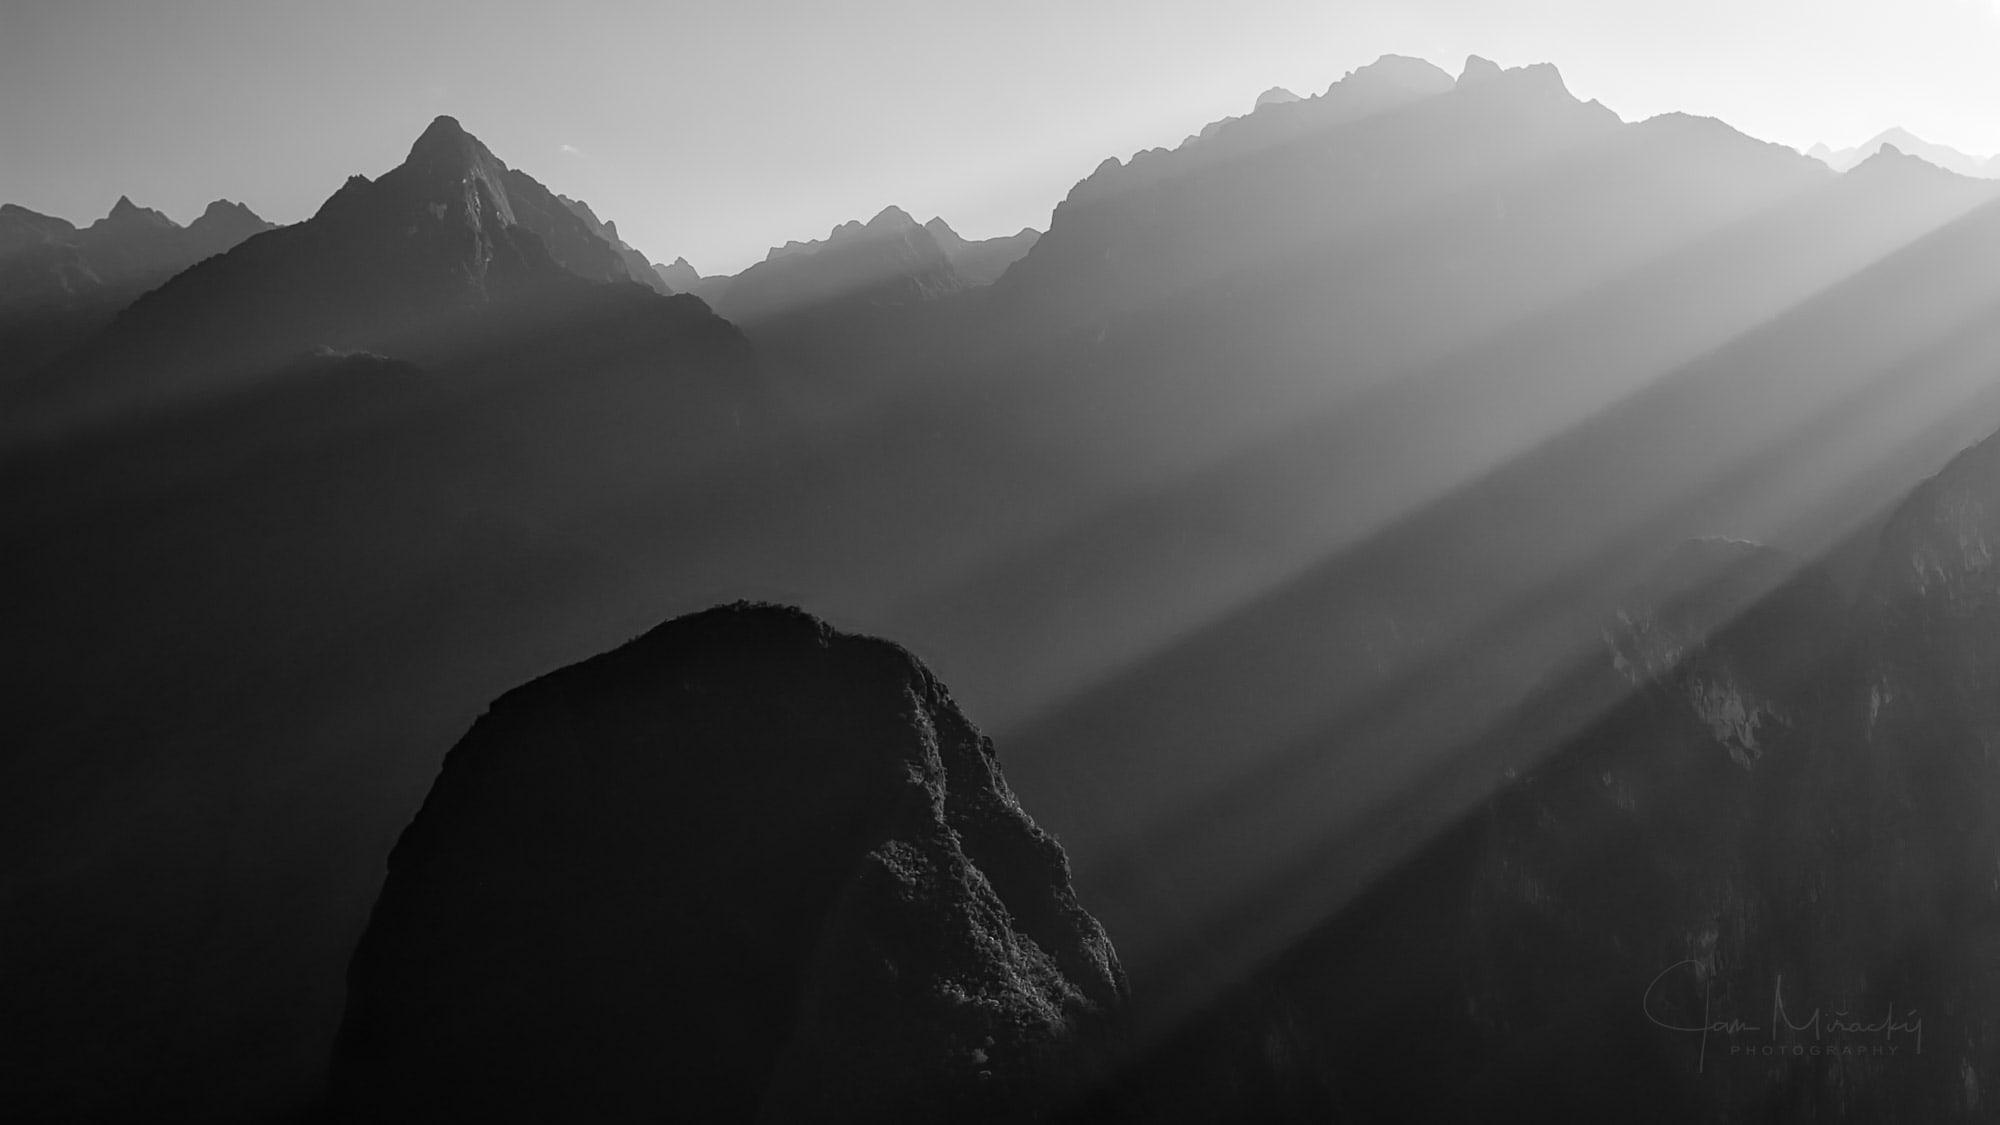 Morning sunbeams illuminating hills around Machu Picchu